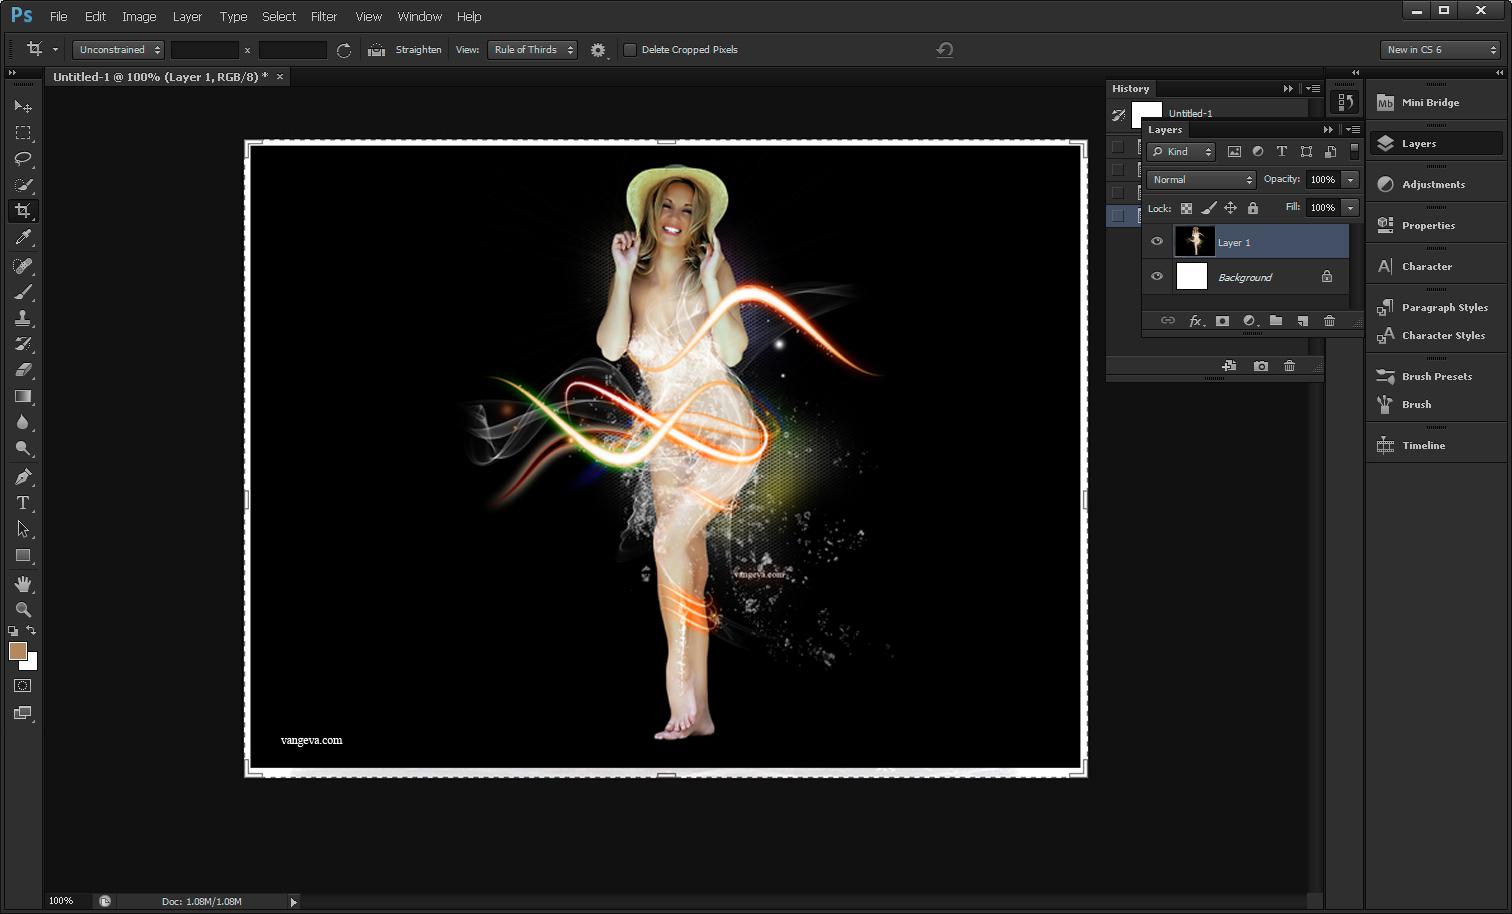 Adobephotoshop cs6 full version free download!